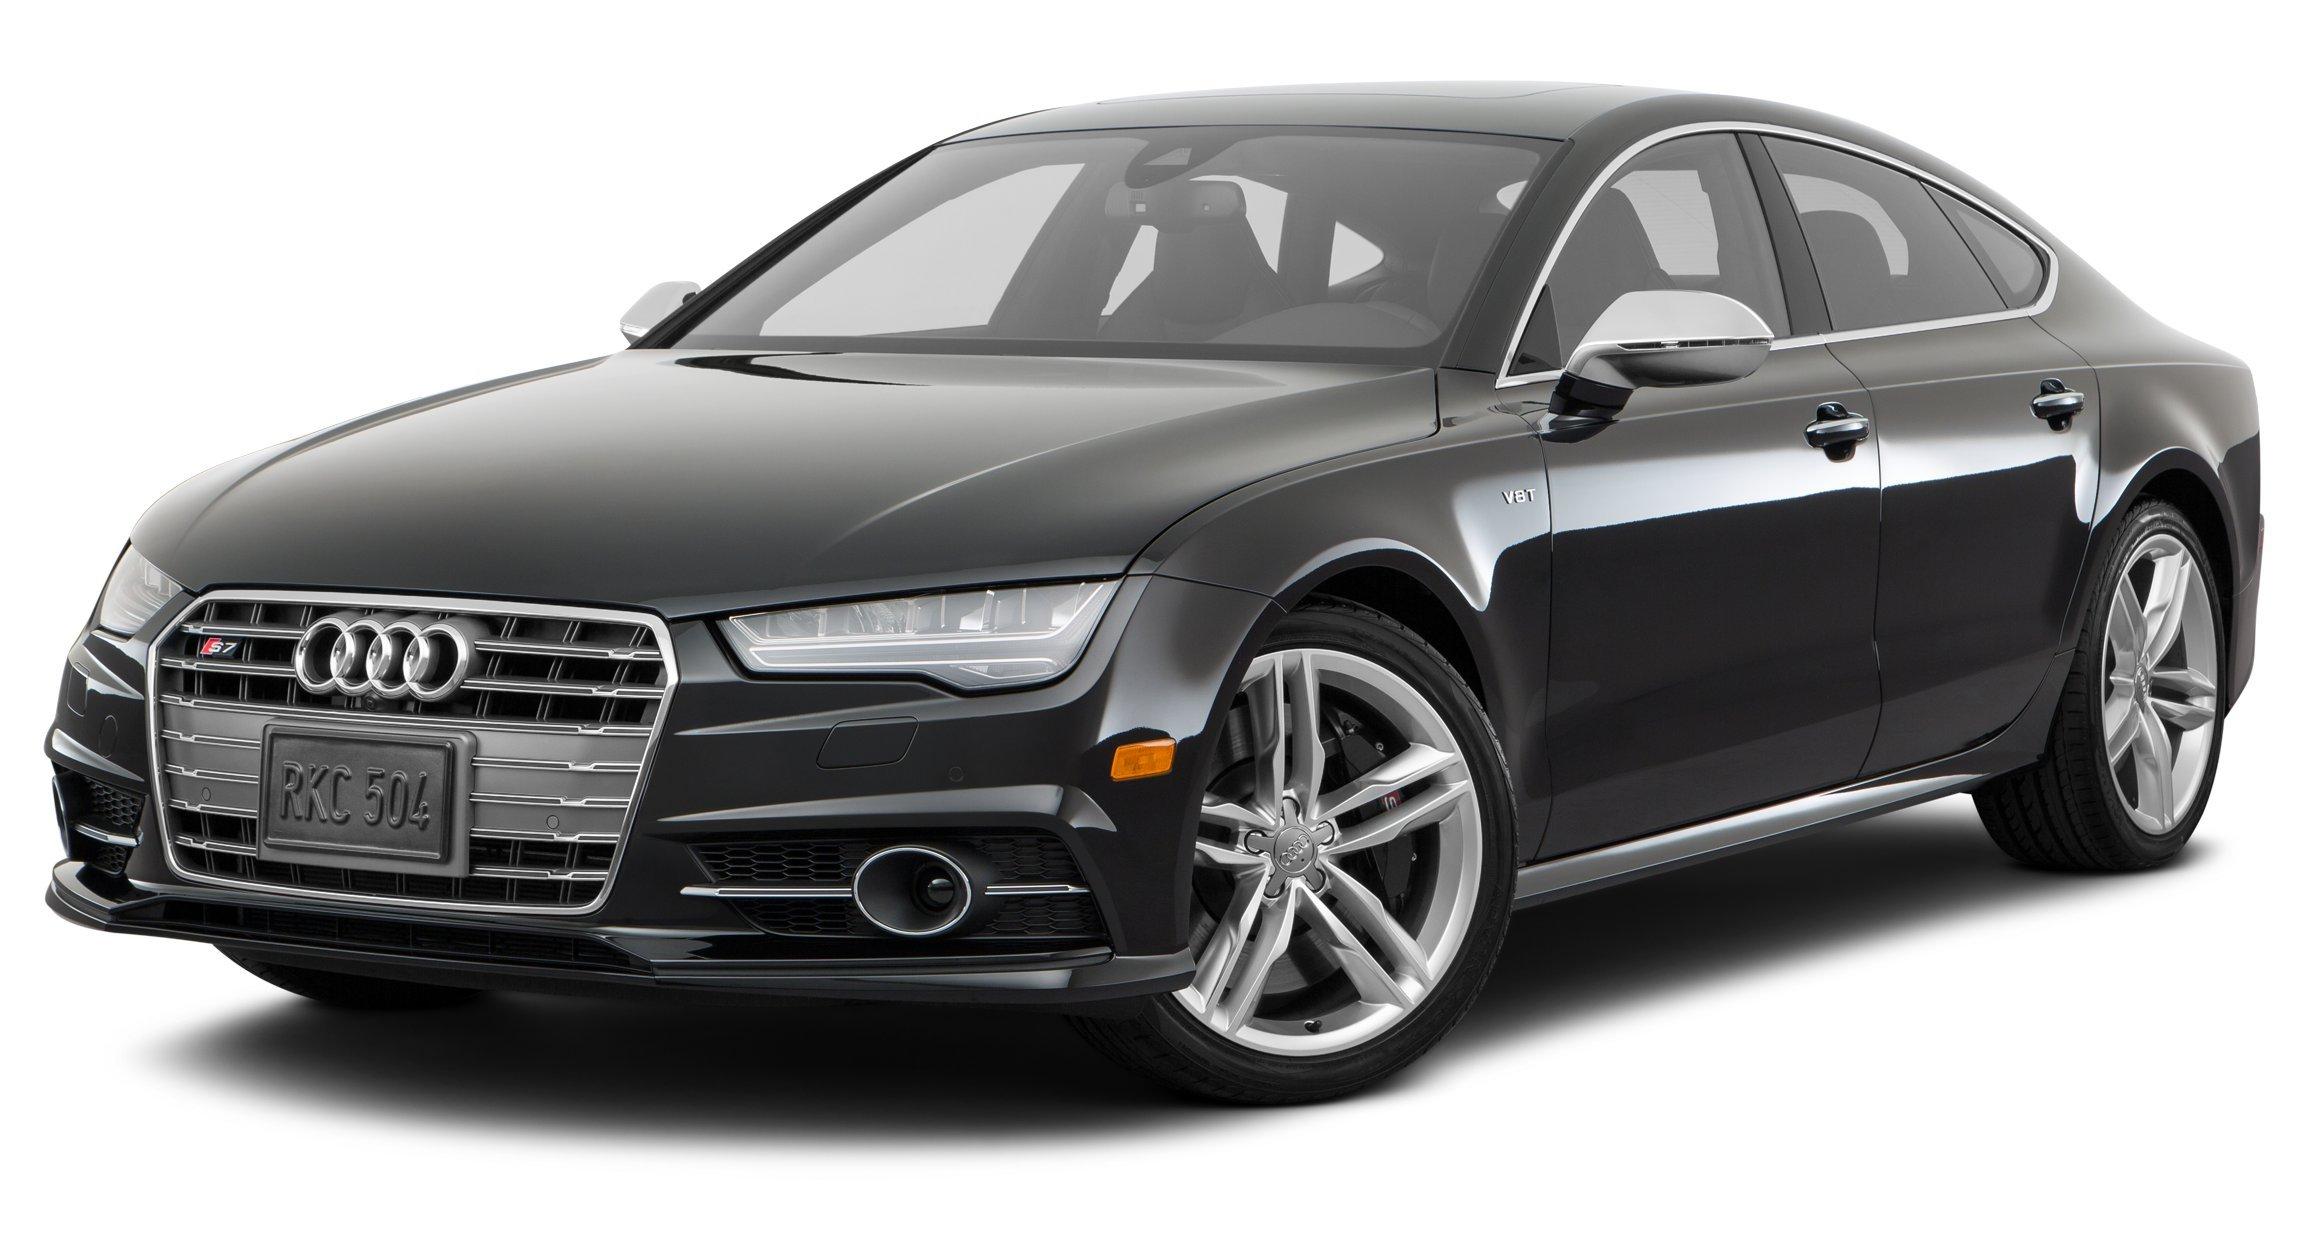 Amazon 2017 Audi A7 Quattro Reviews and Specs Vehicles